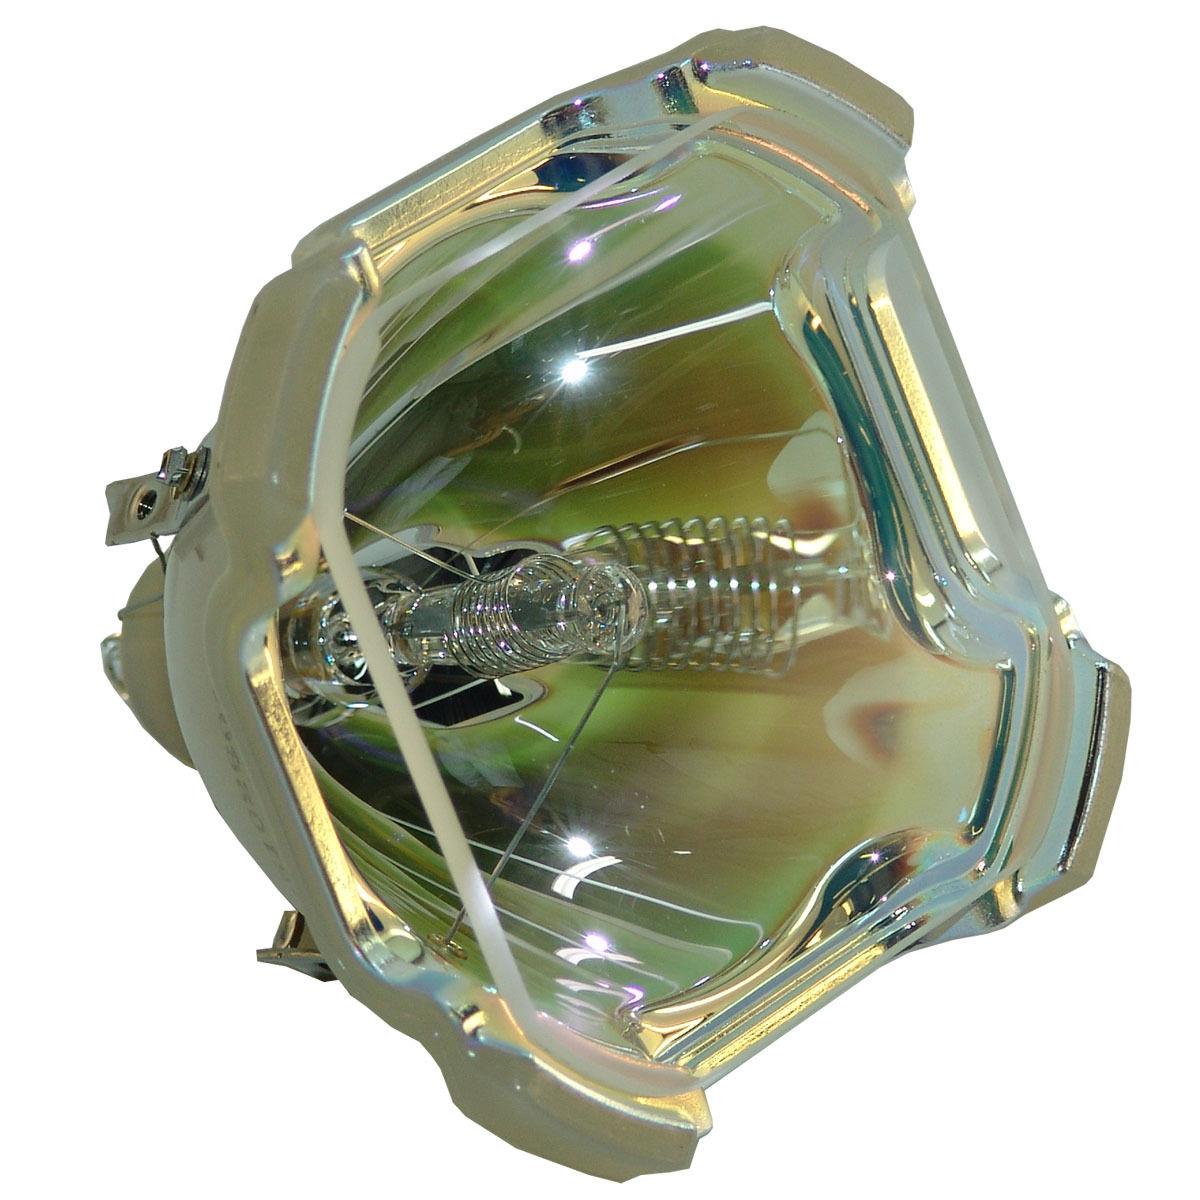 Compatible Bare Bulb POA-LMP105 LMP105 610-330-7329 for SANYO PLC-XT20 PLC-XT21 PLC-XT25 Projector lamp bulb without housing  compatible bare bulb poa lmp57 lmp57 610 308 3117 for sanyo plc sw30 plc sw35 projector lamp bulb without housing free shipping